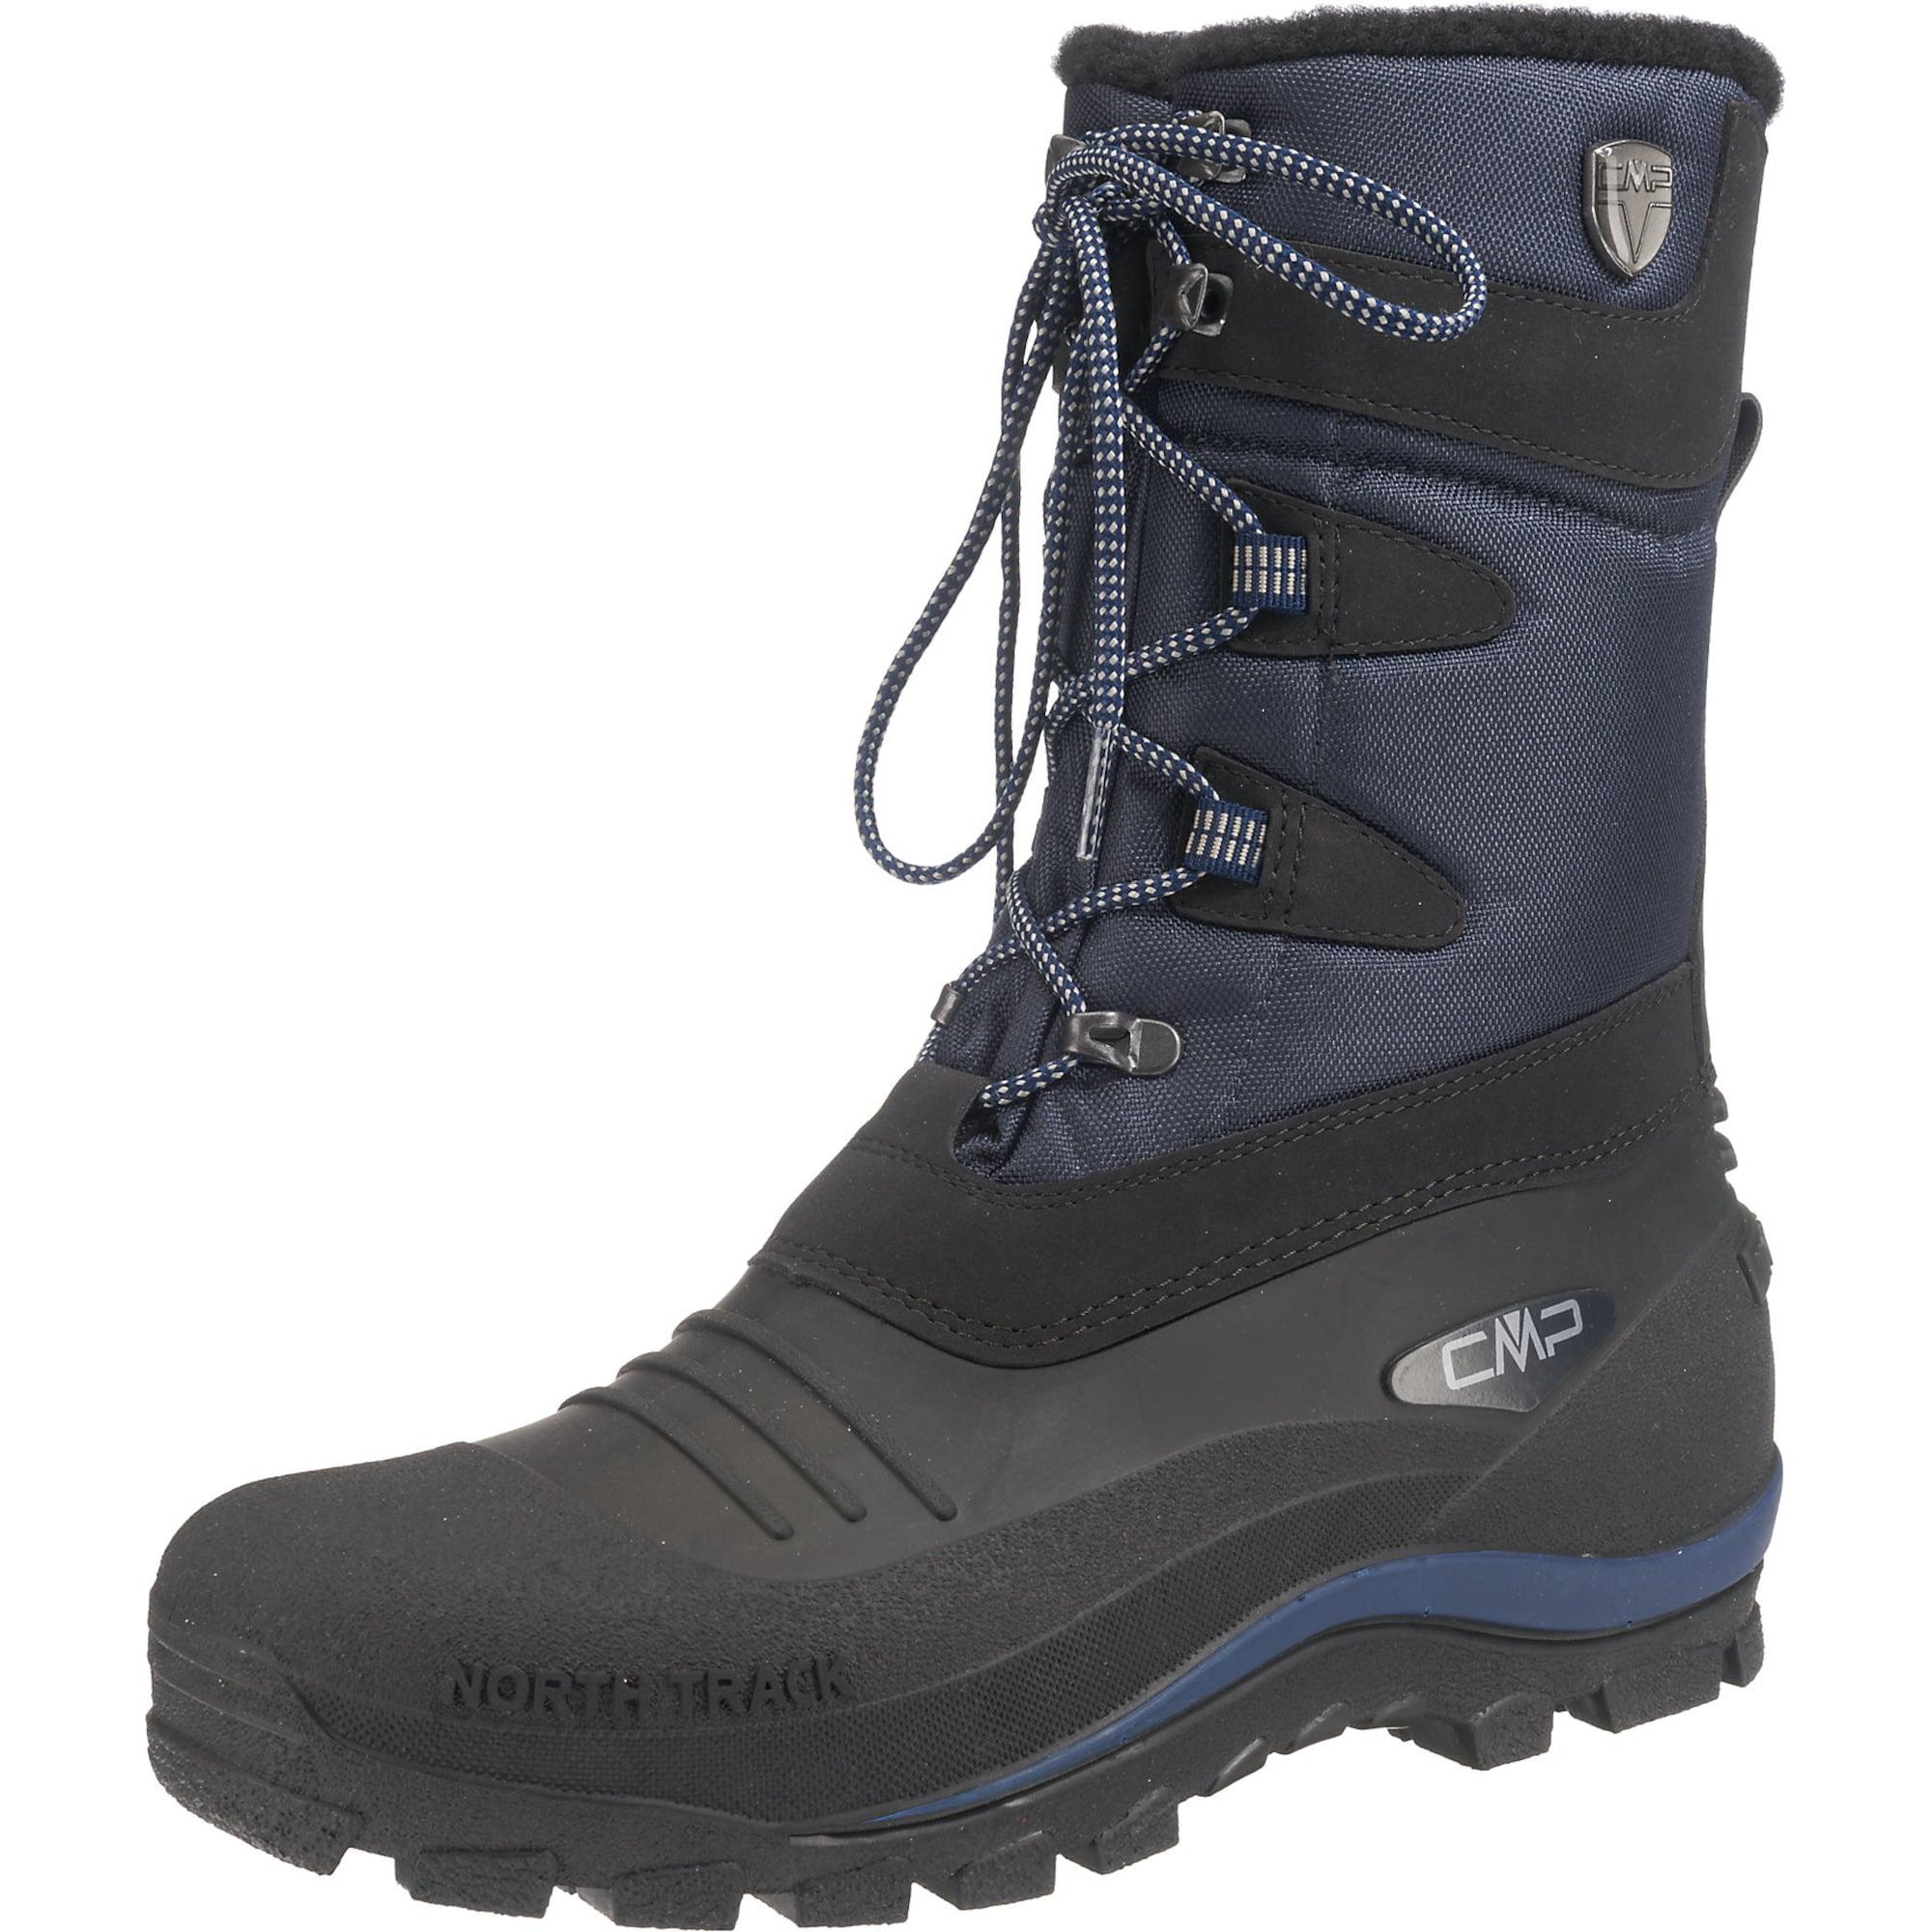 Winterstiefel   Schuhe > Boots > Winterstiefel   CMP